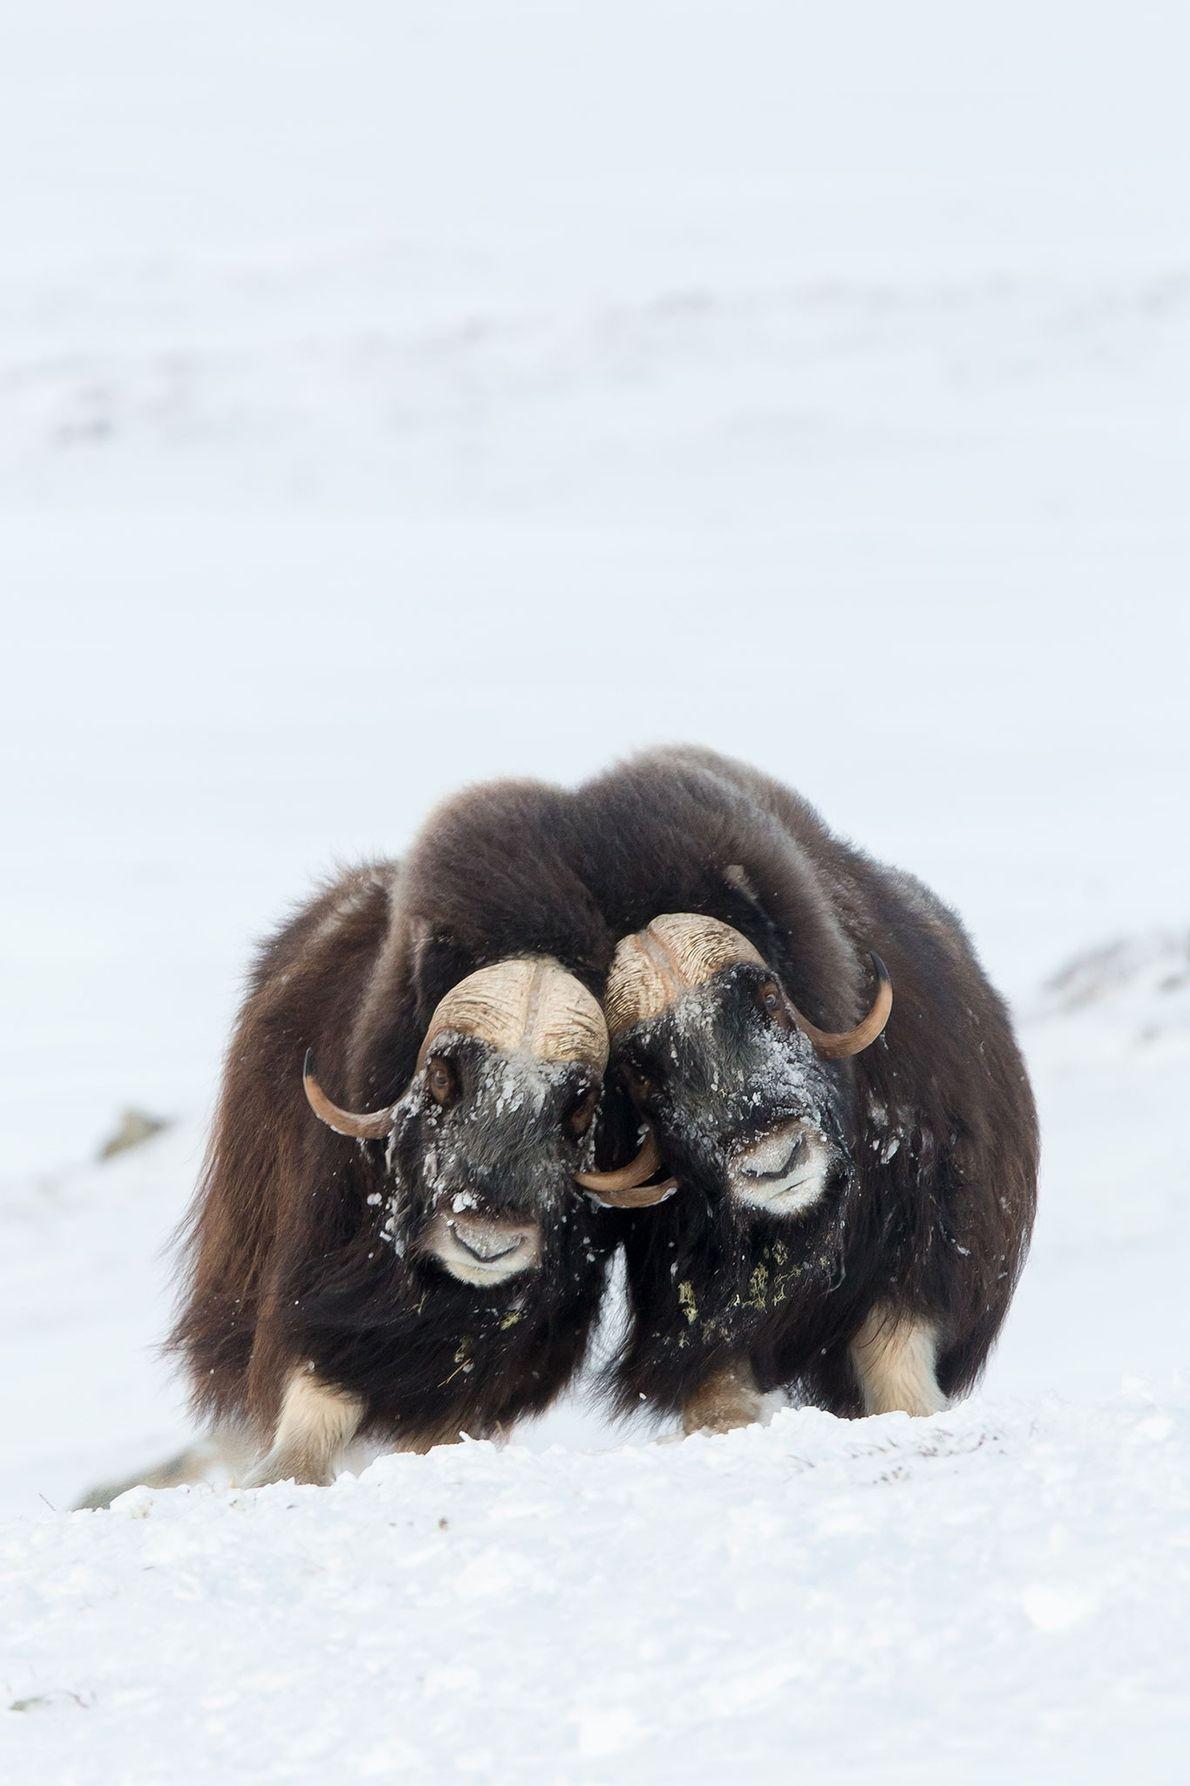 Musk oxen throw their weight around in Norway.